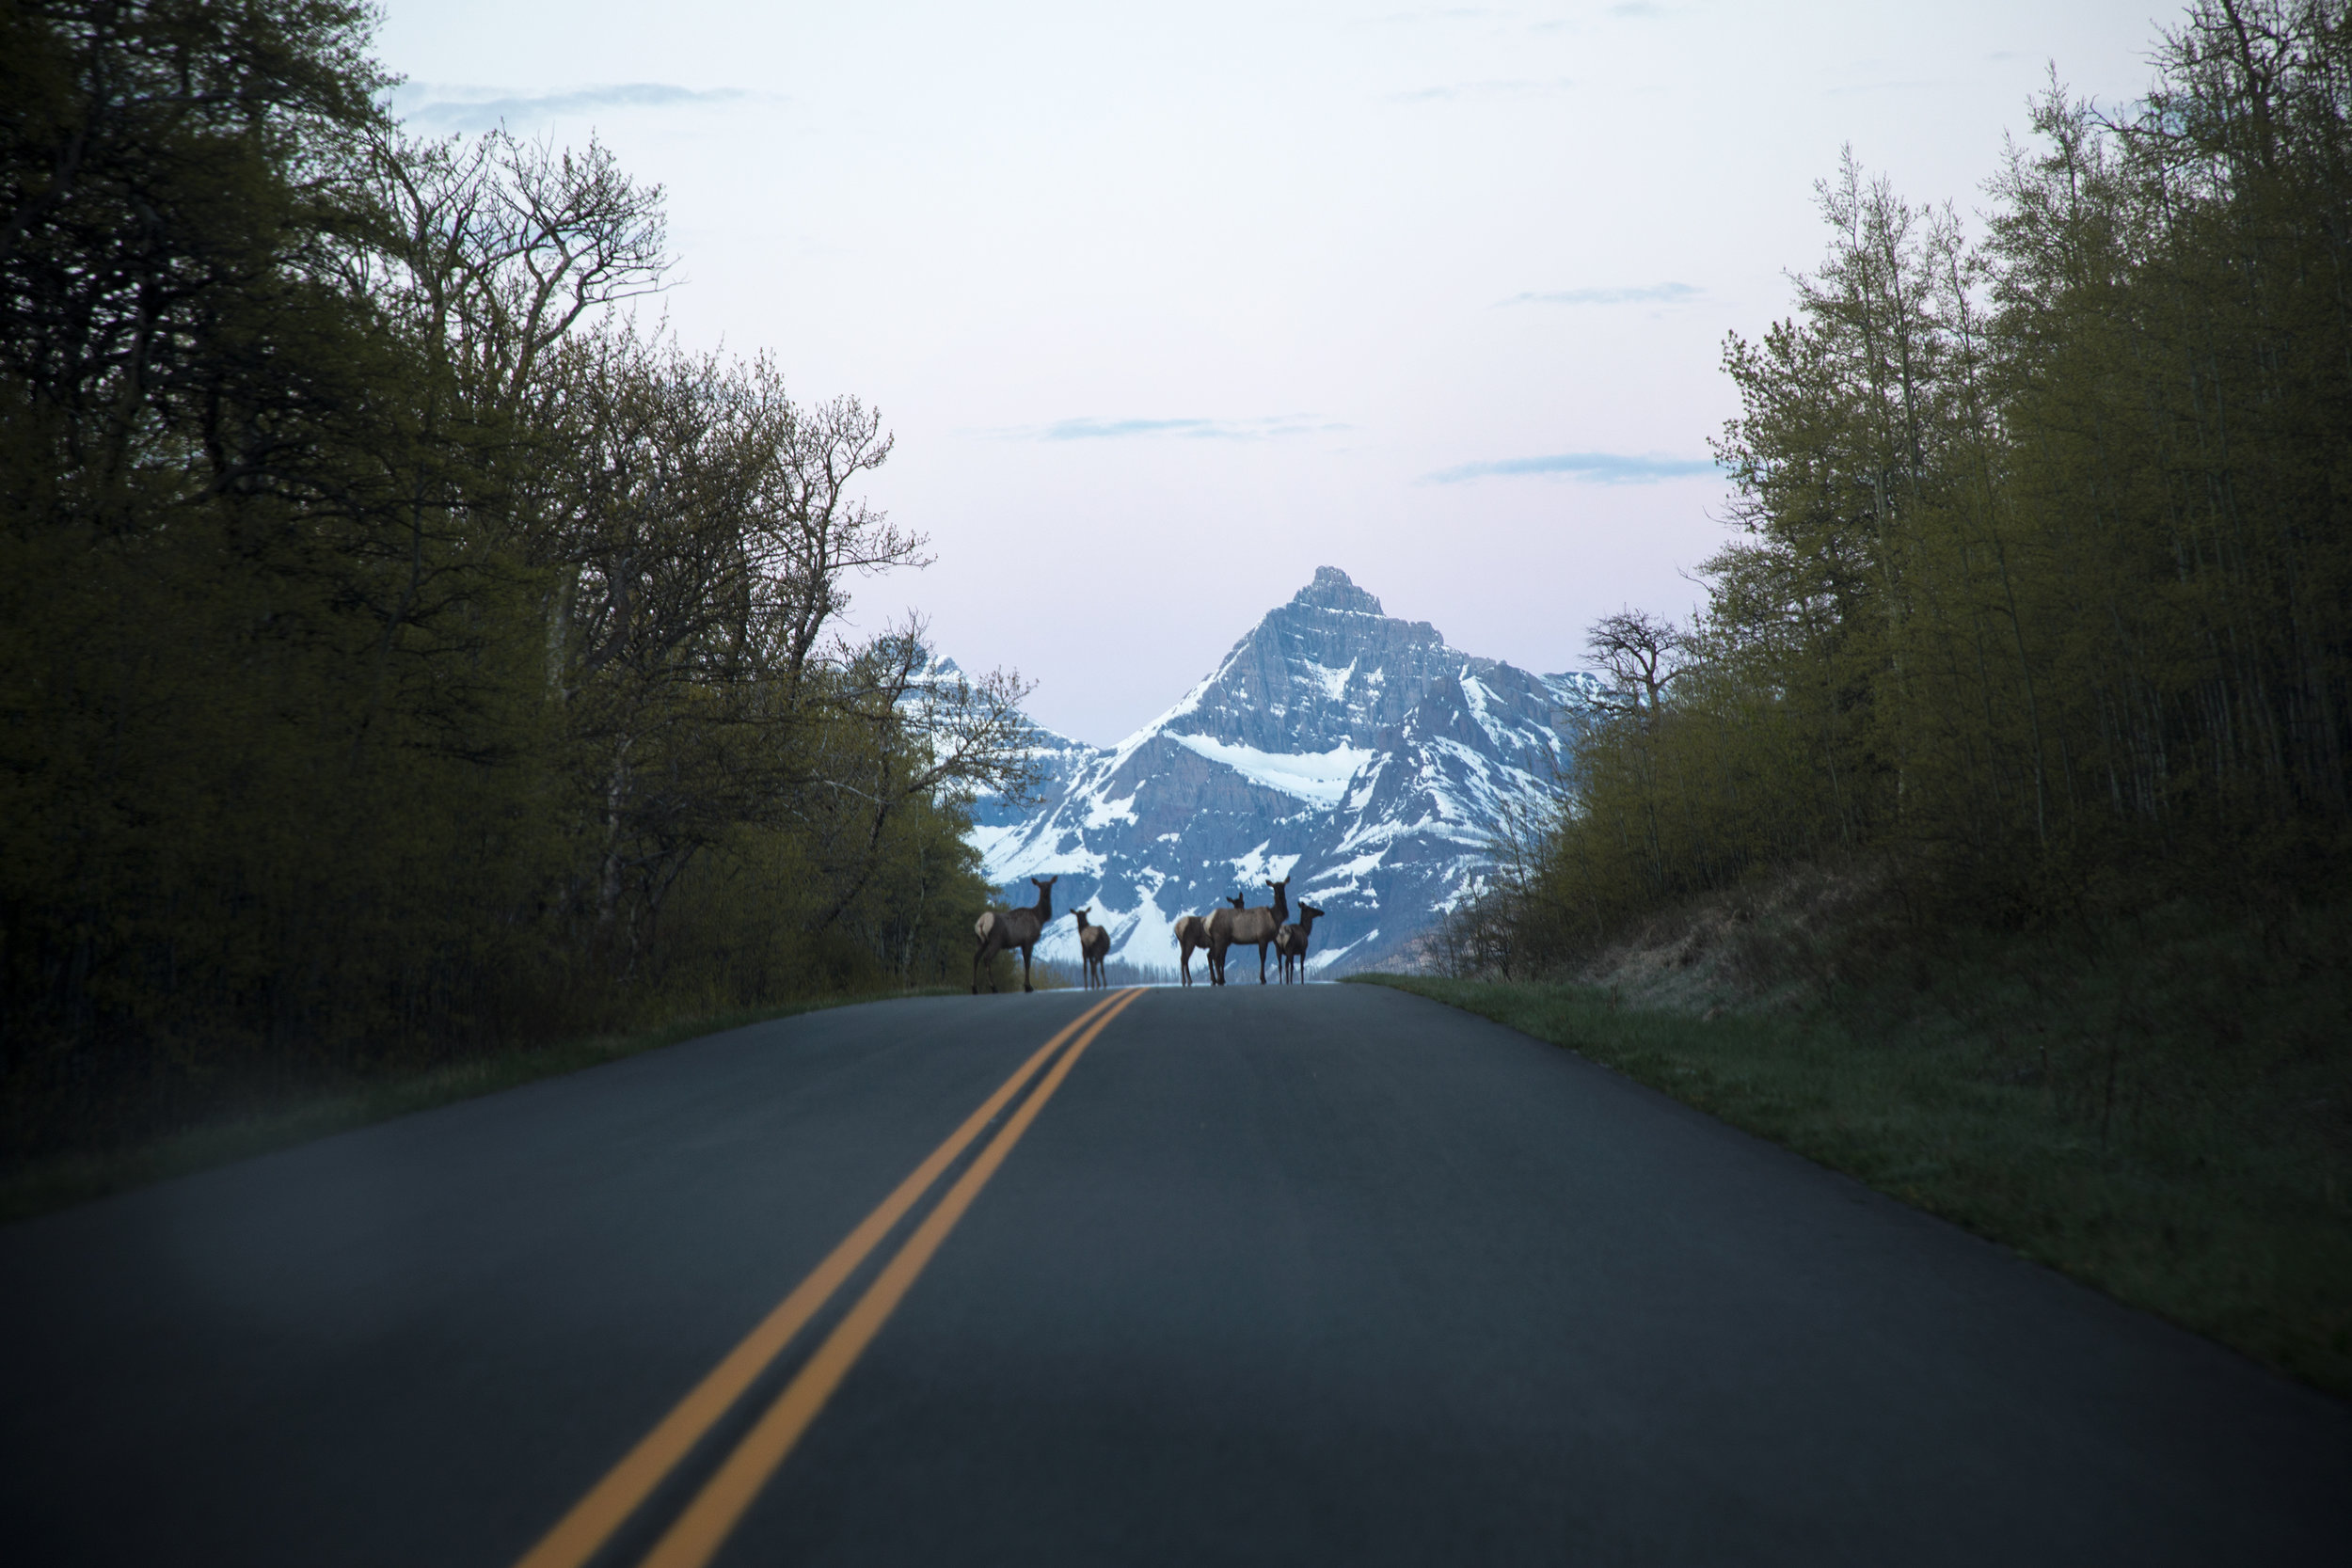 RoadBlock_web_large.jpg